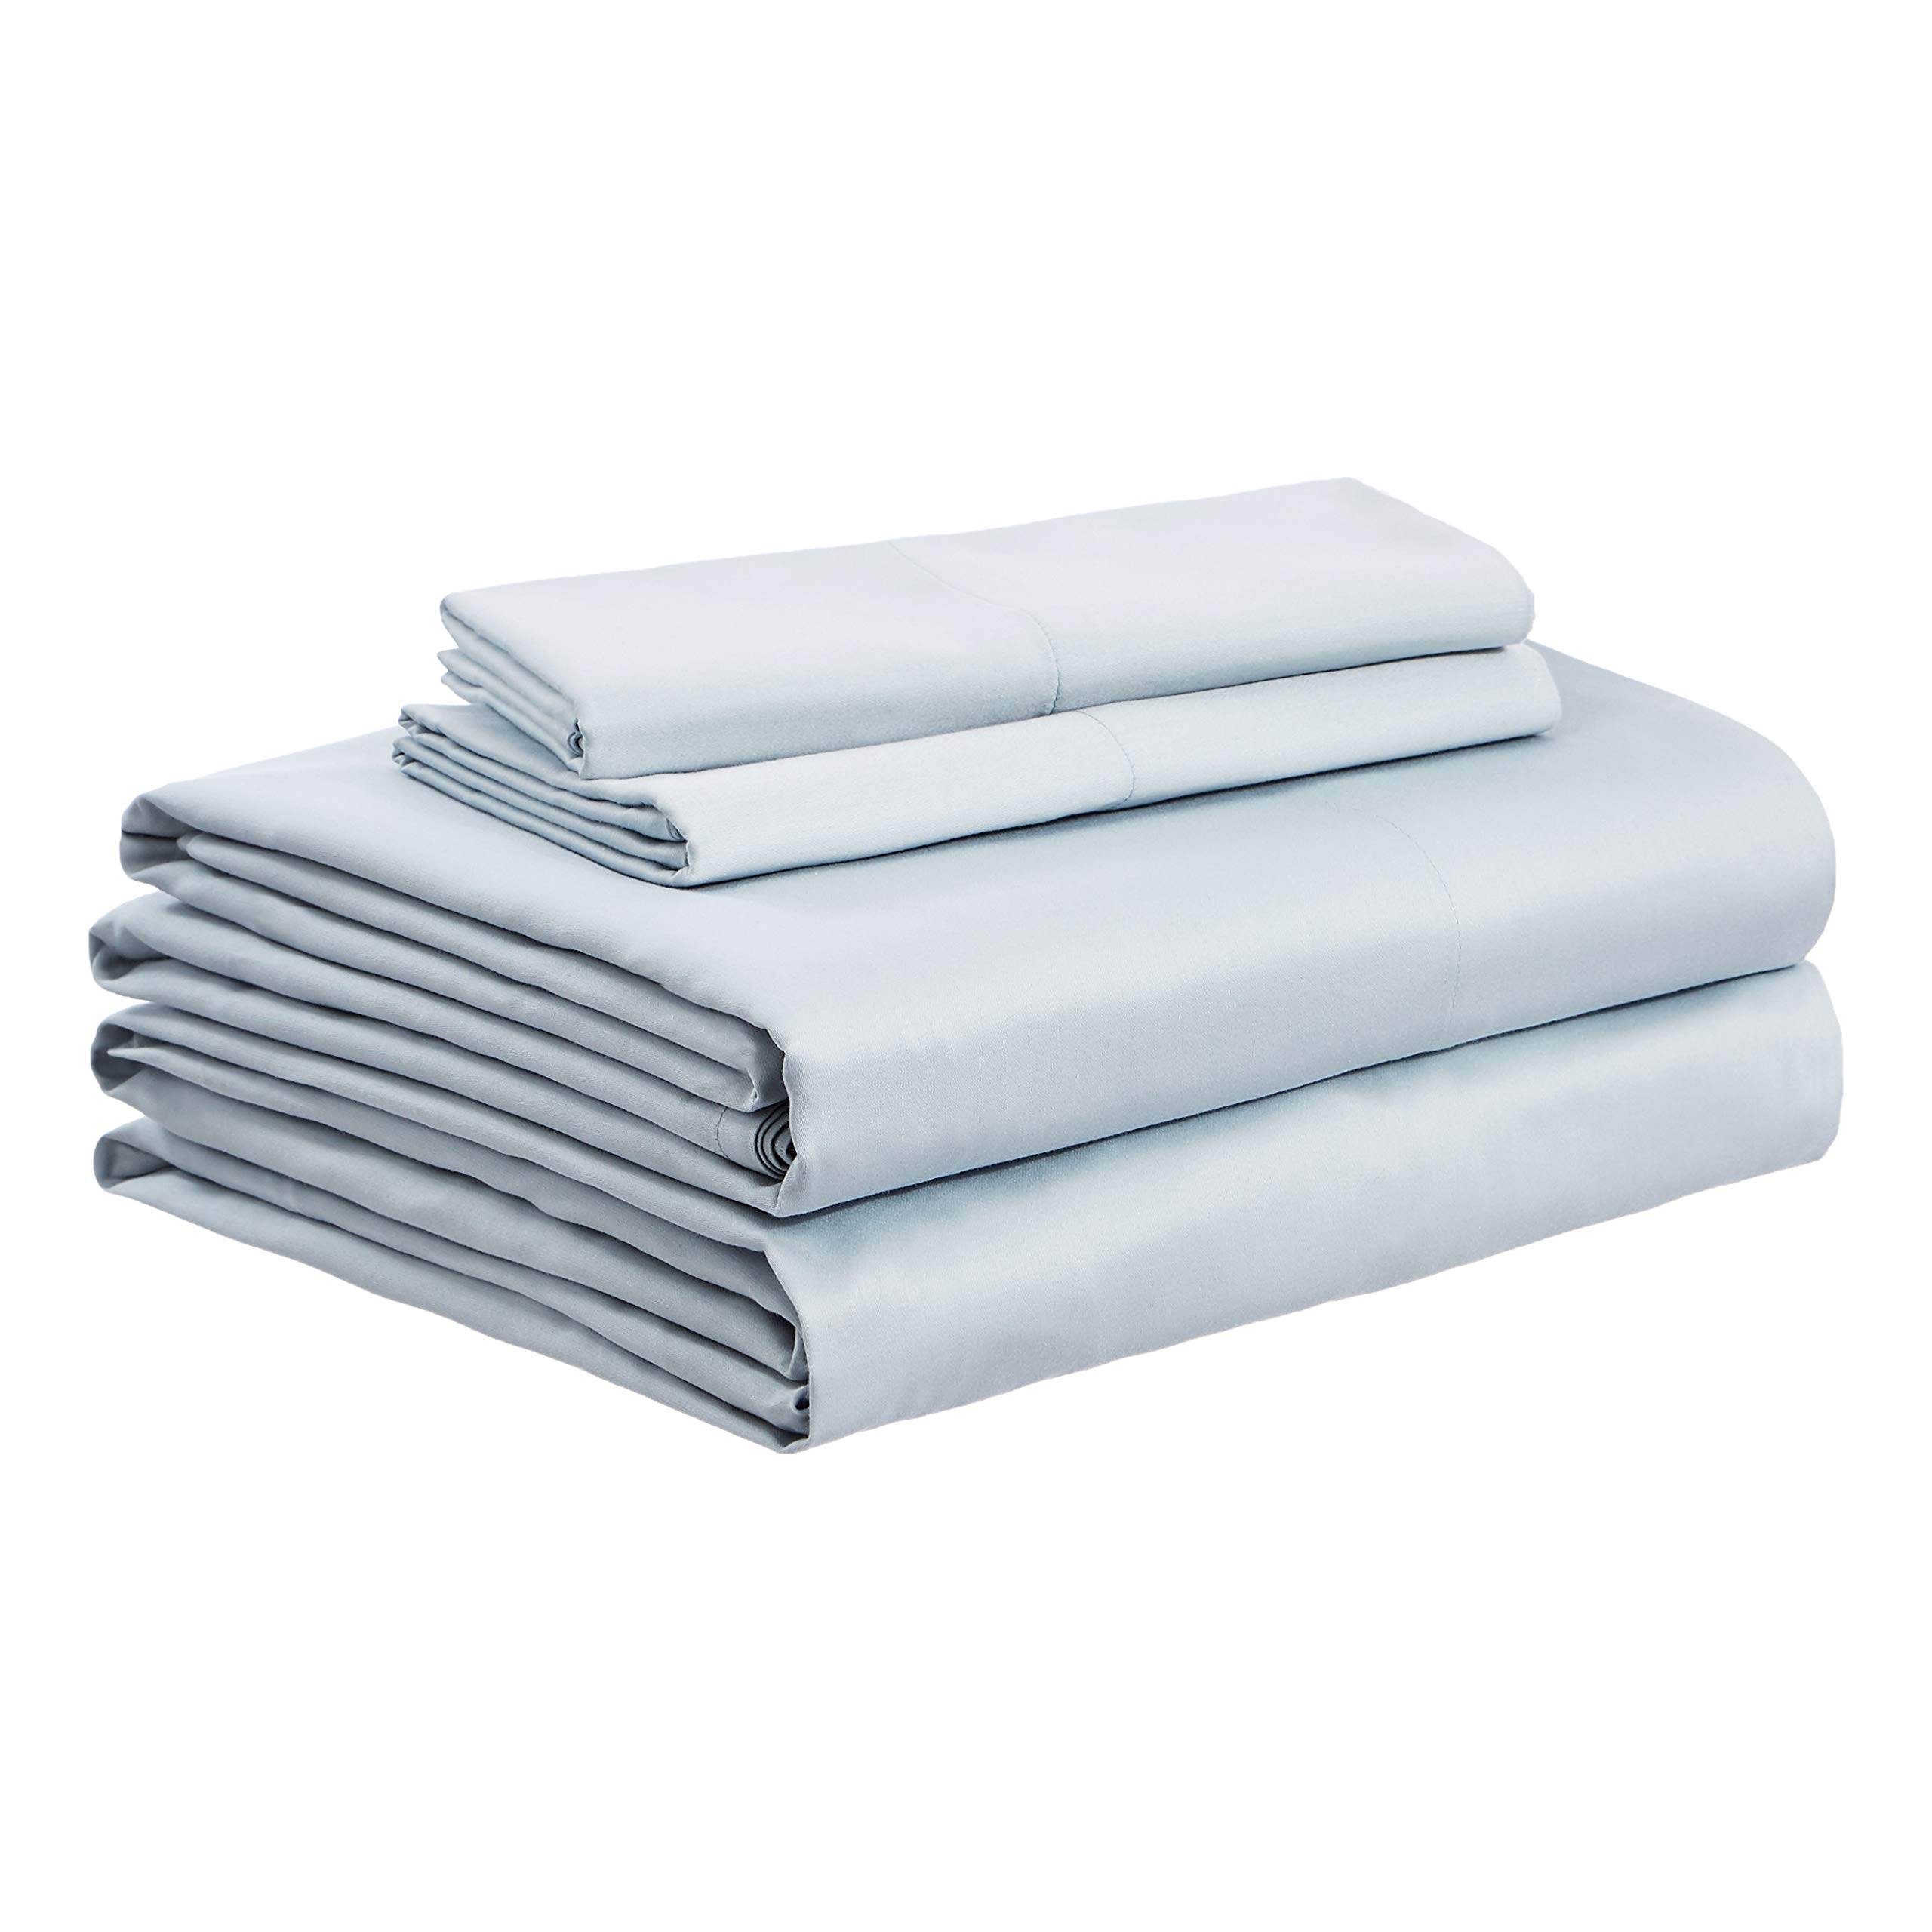 AmazonBasics Organic Sateen Cotton Sheet Set - Queen, Sage Green